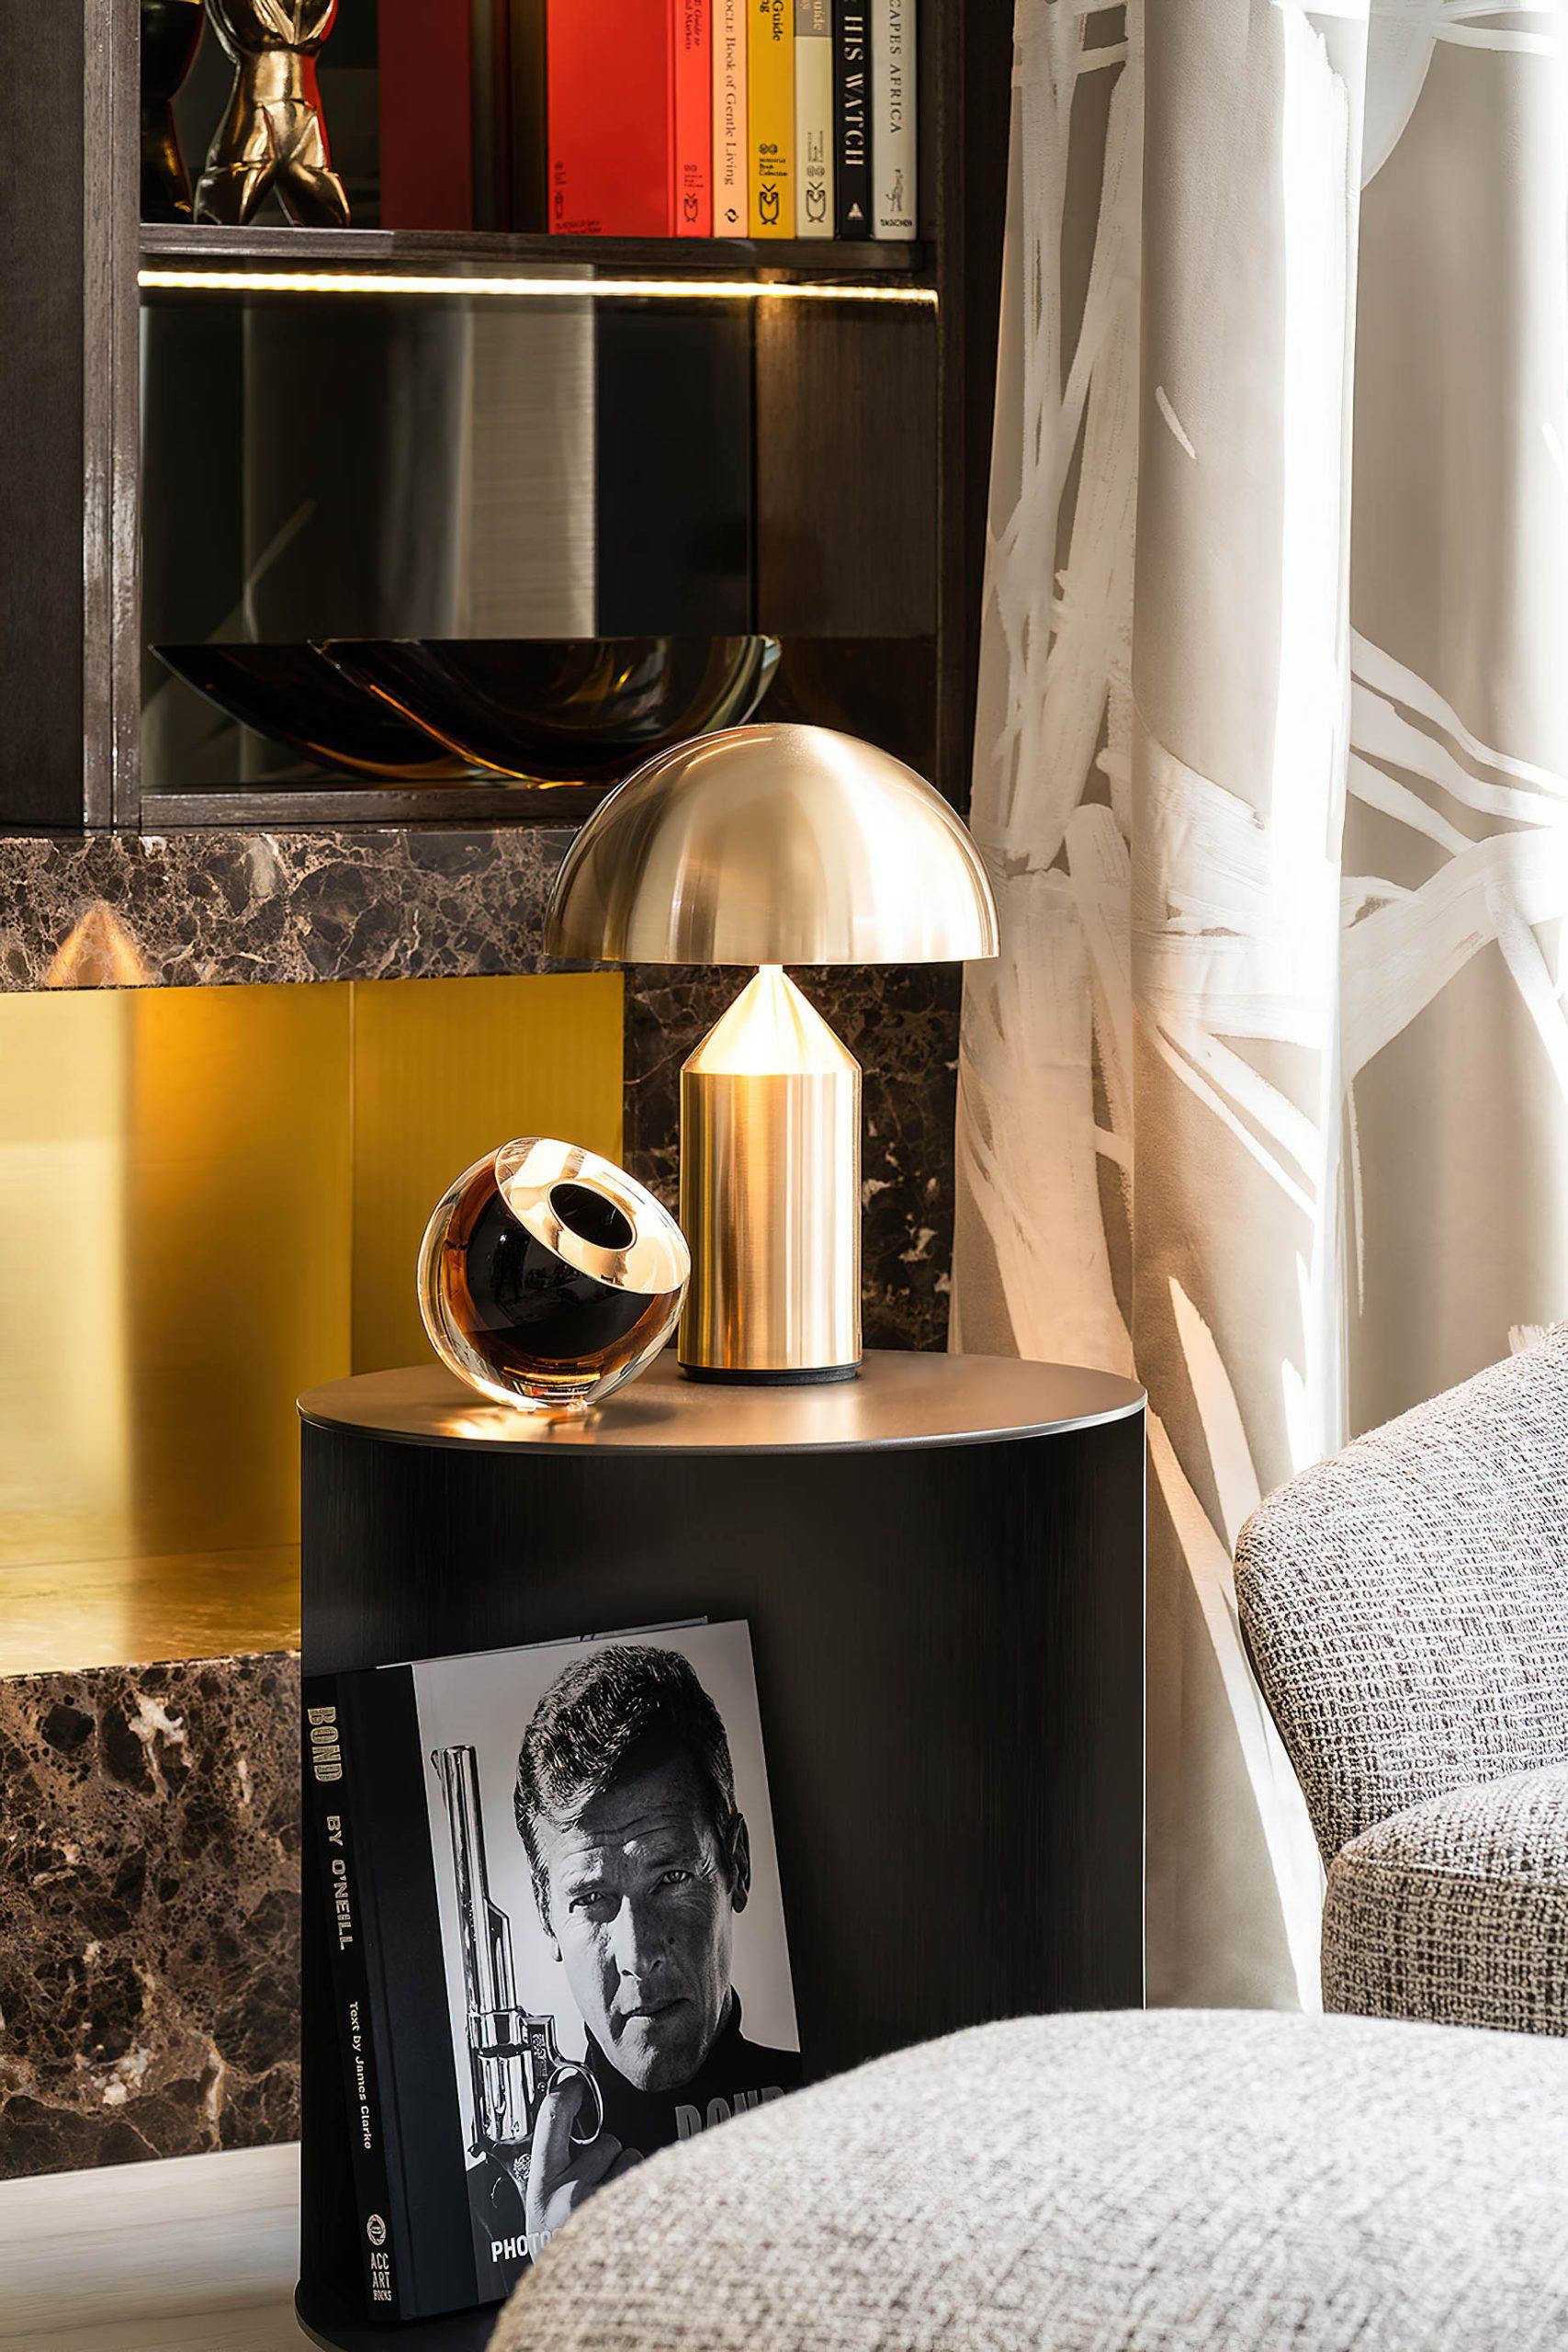 Kensington Home Interior Design London, UK – Kris Turnbull